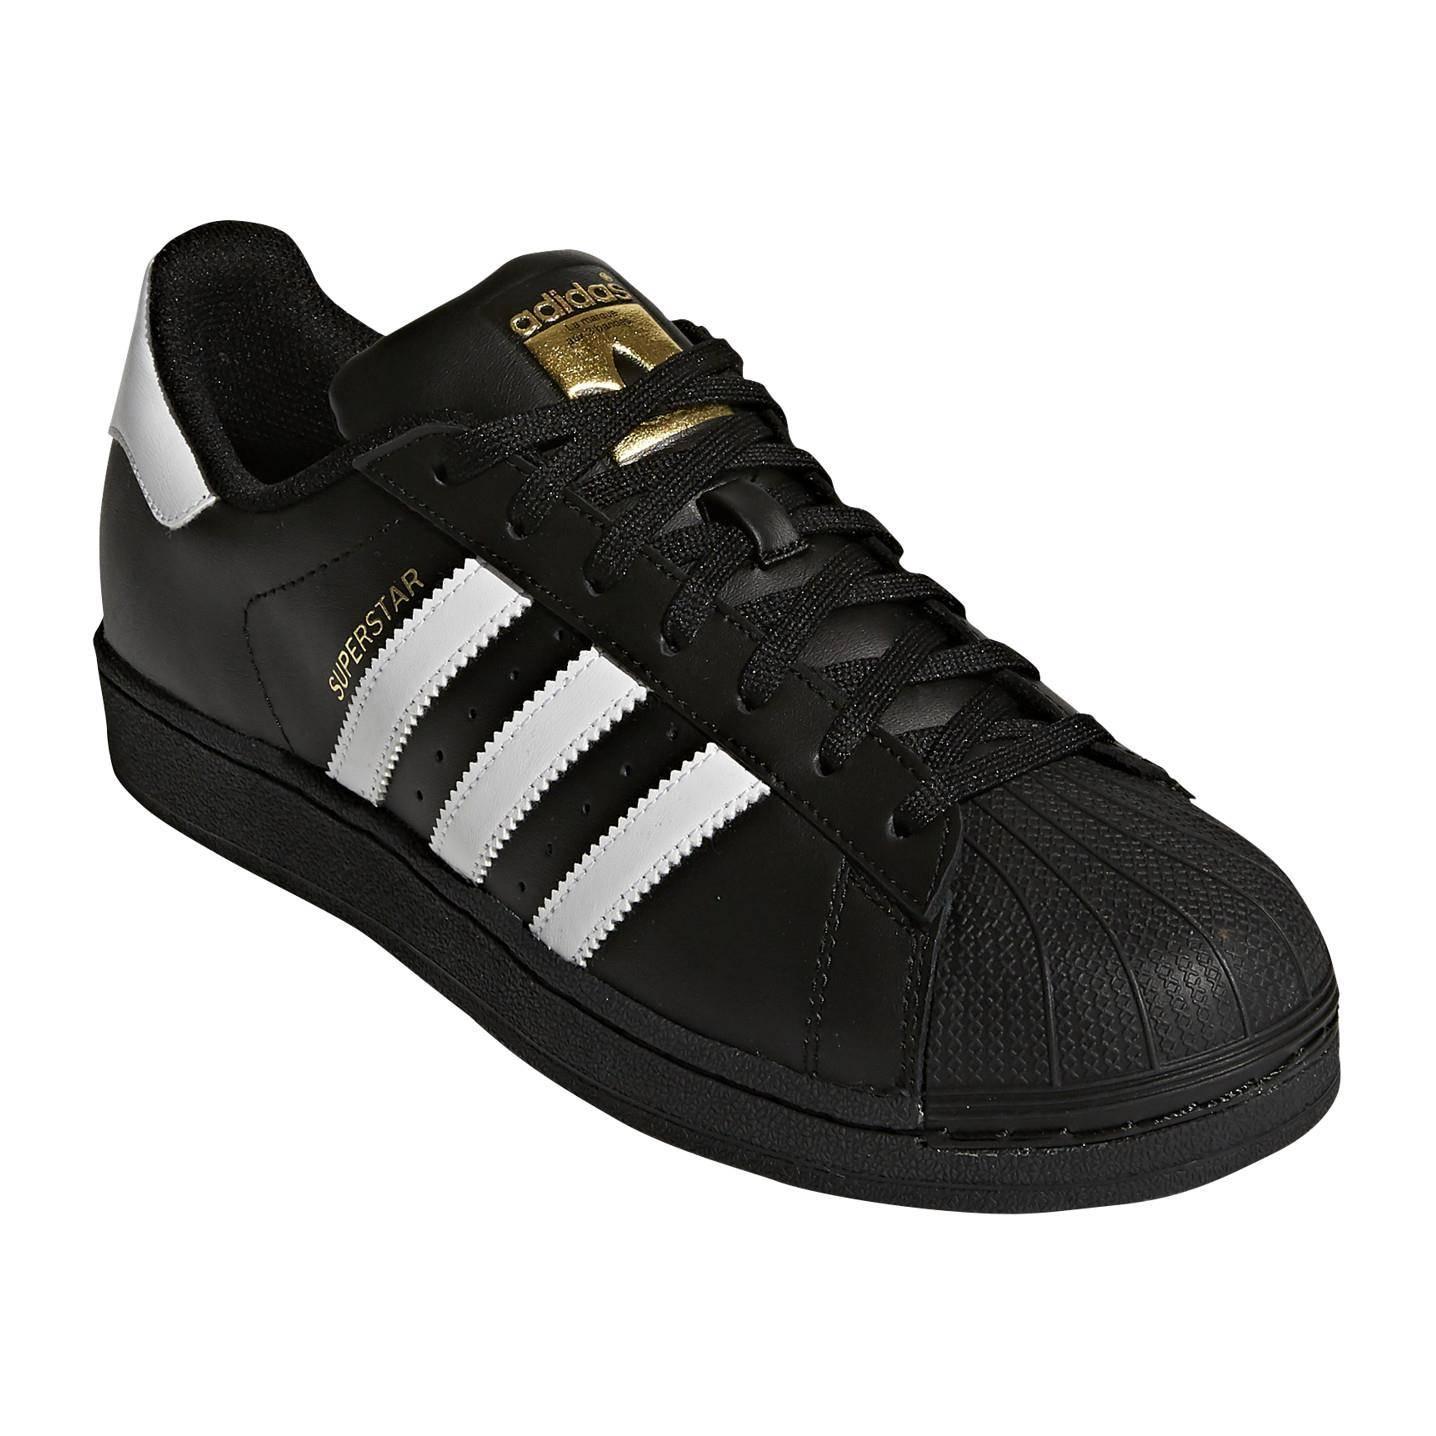 damskie buty Adidas Superstar B27140 skrzane